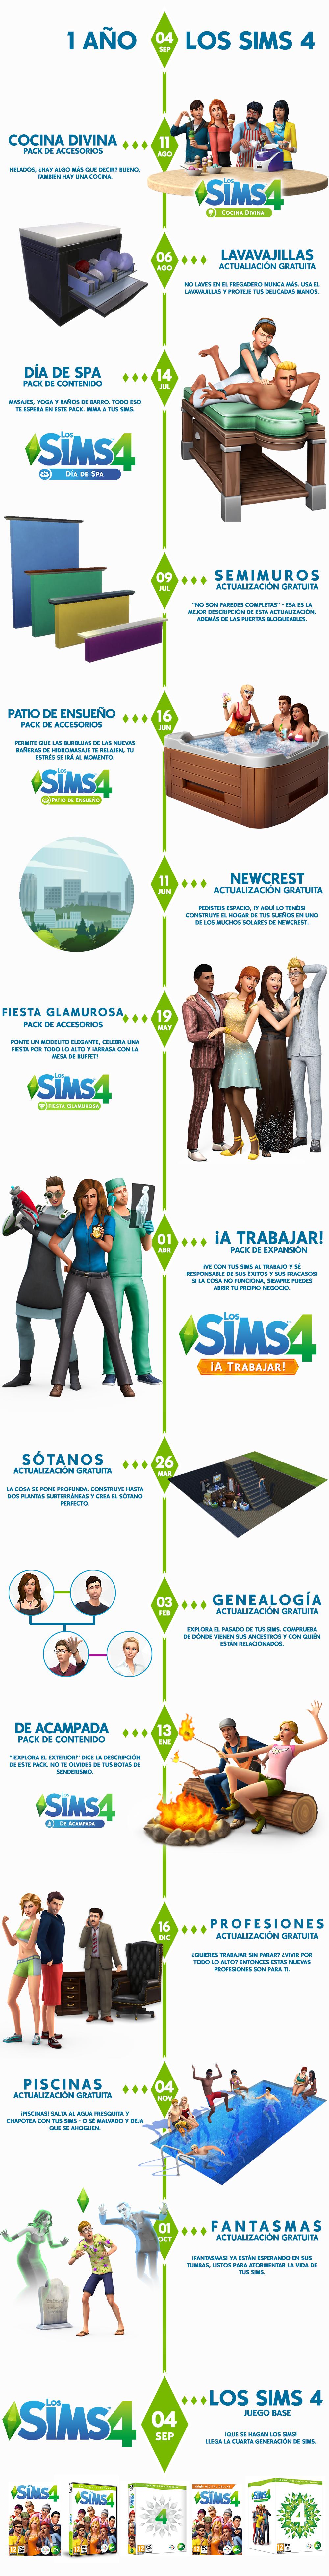 infografia-sims4-ano1